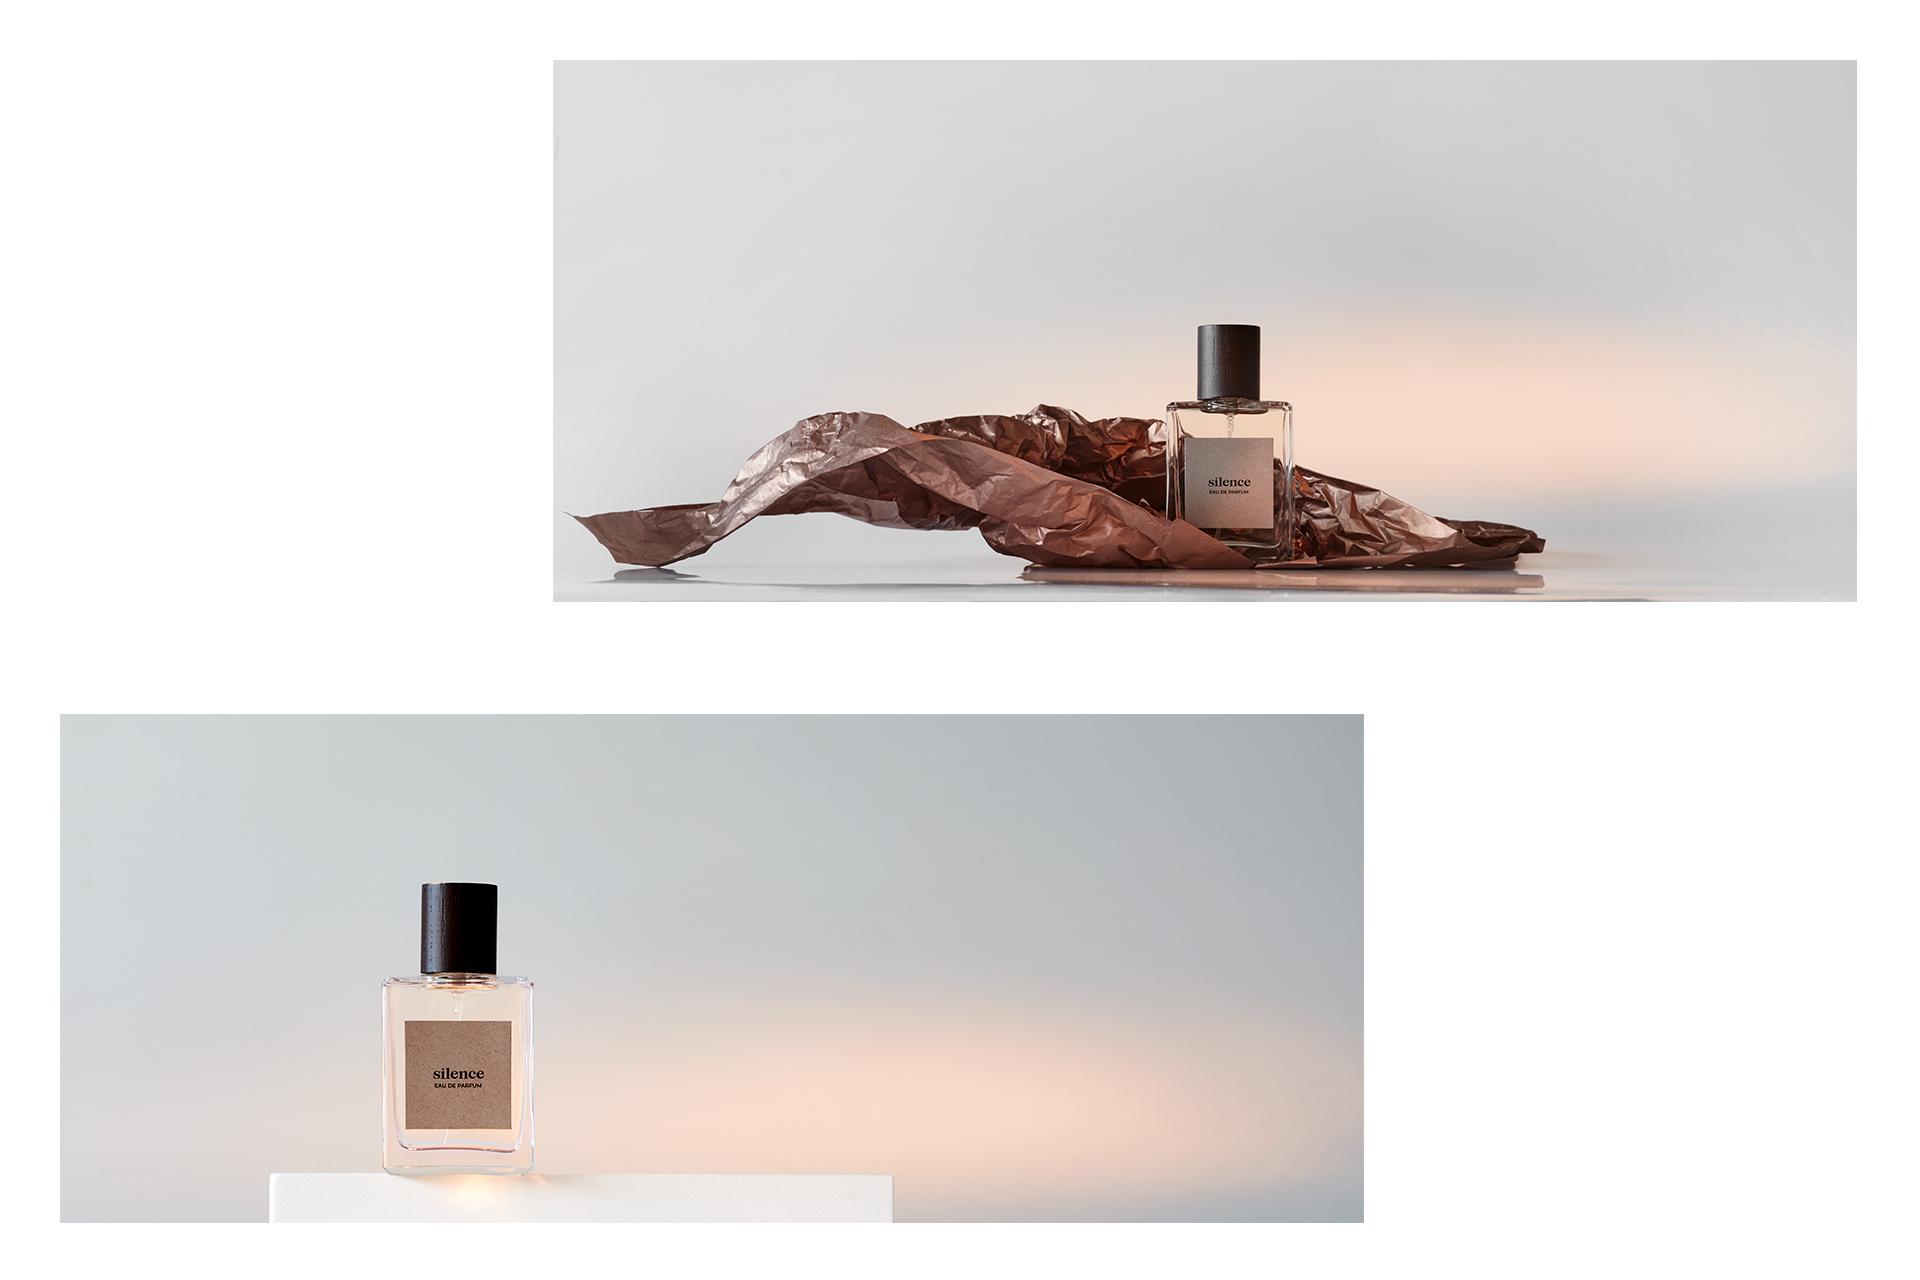 Silenceworks 'Eau de Parfum' by Silenceworks - Creative Work - $i